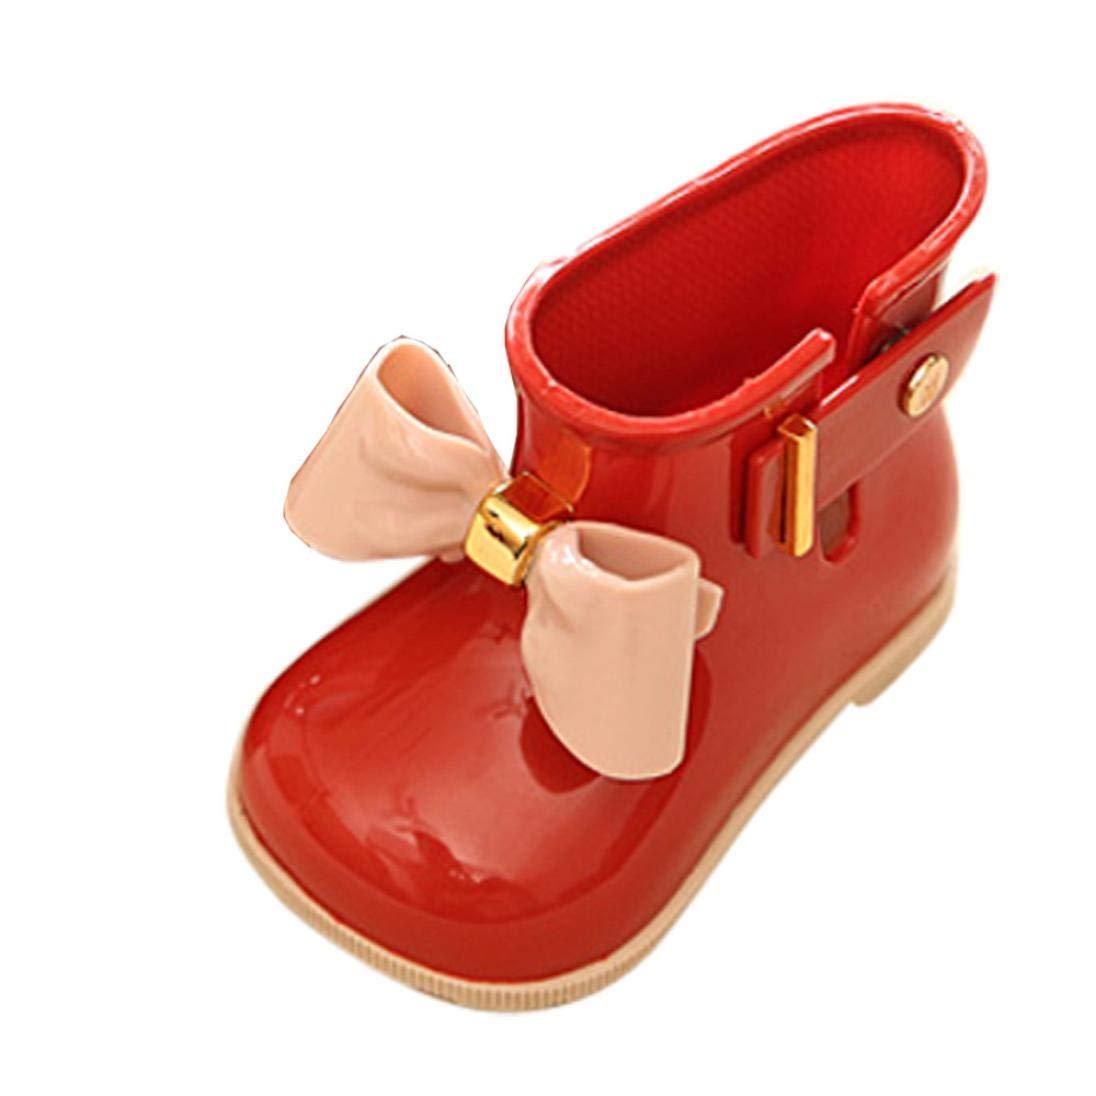 ZODOF Cute Baby Jelly Shoes Girl Shoes Niños Bow Rain Boot Calzado Deportivo Running Zapatos Ligero y Transpirables para Unisex Niños